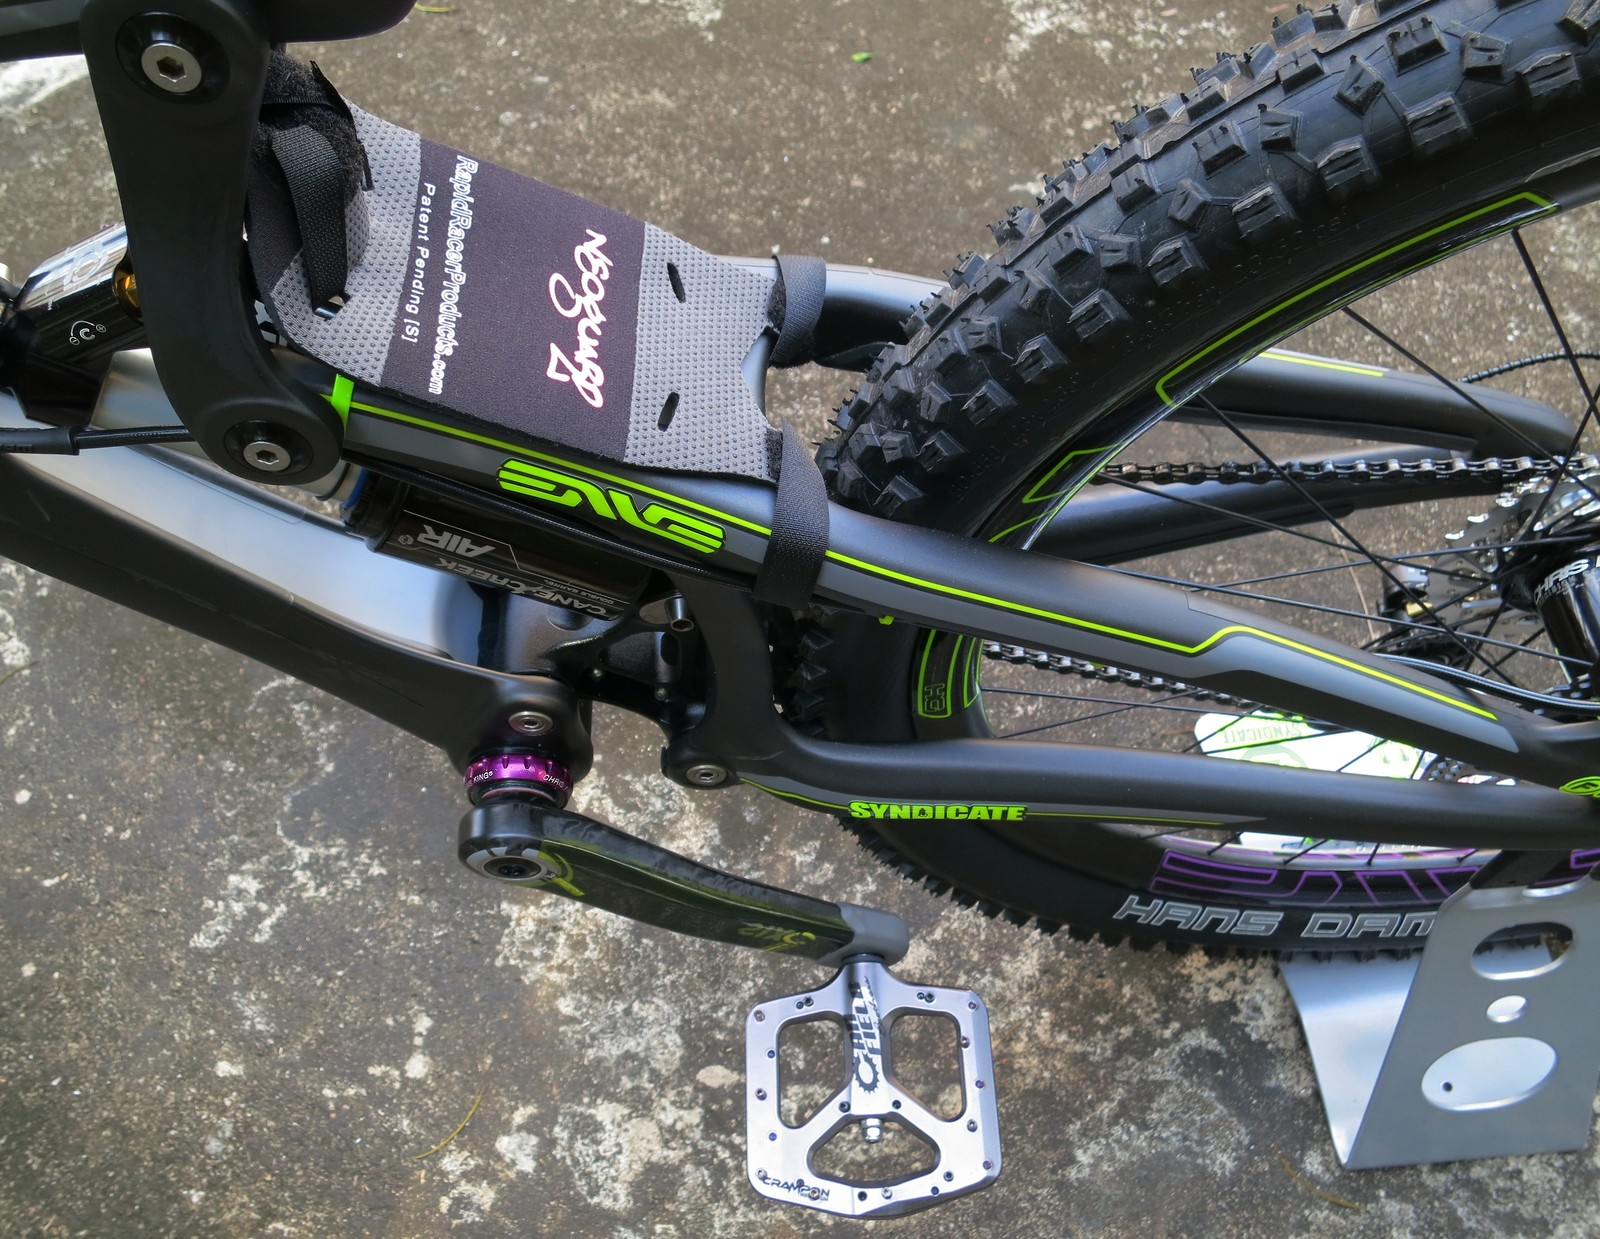 Santa Cruz V10 5 Carbon Bigjohnmtb S Bike Check Vital Mtb